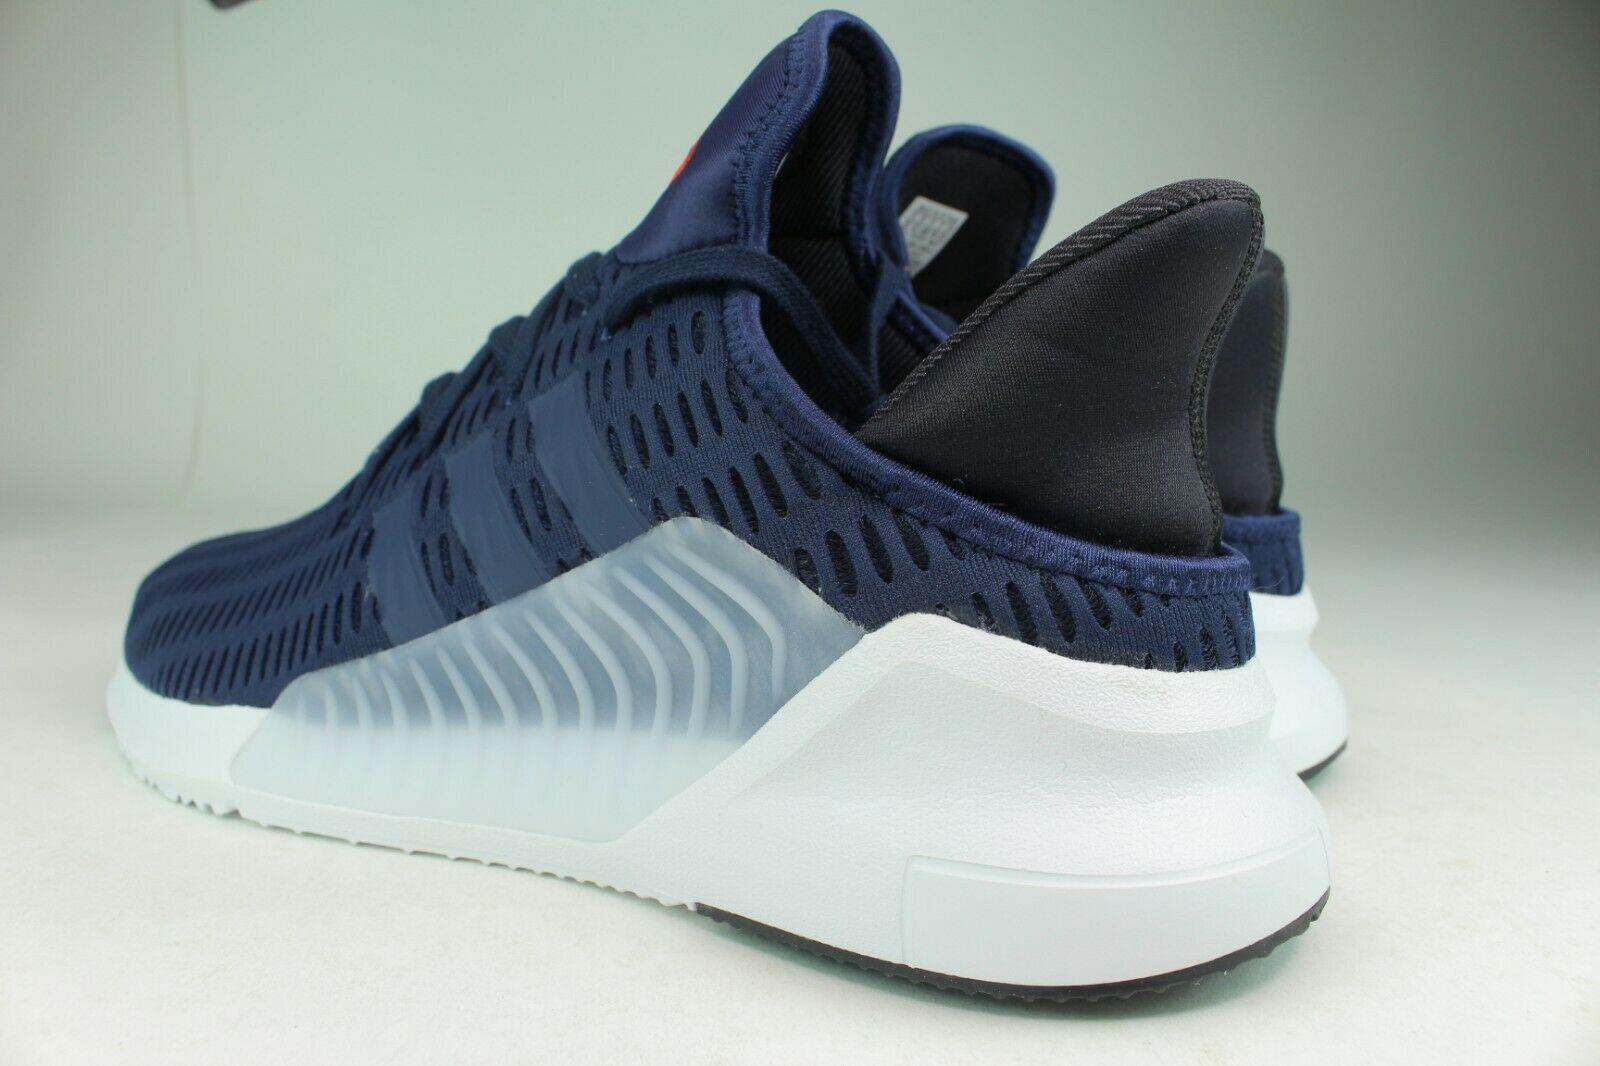 and items 0217 0 CG3342 Men 13 Climacool similar 41 Adidas Size R4jL5A